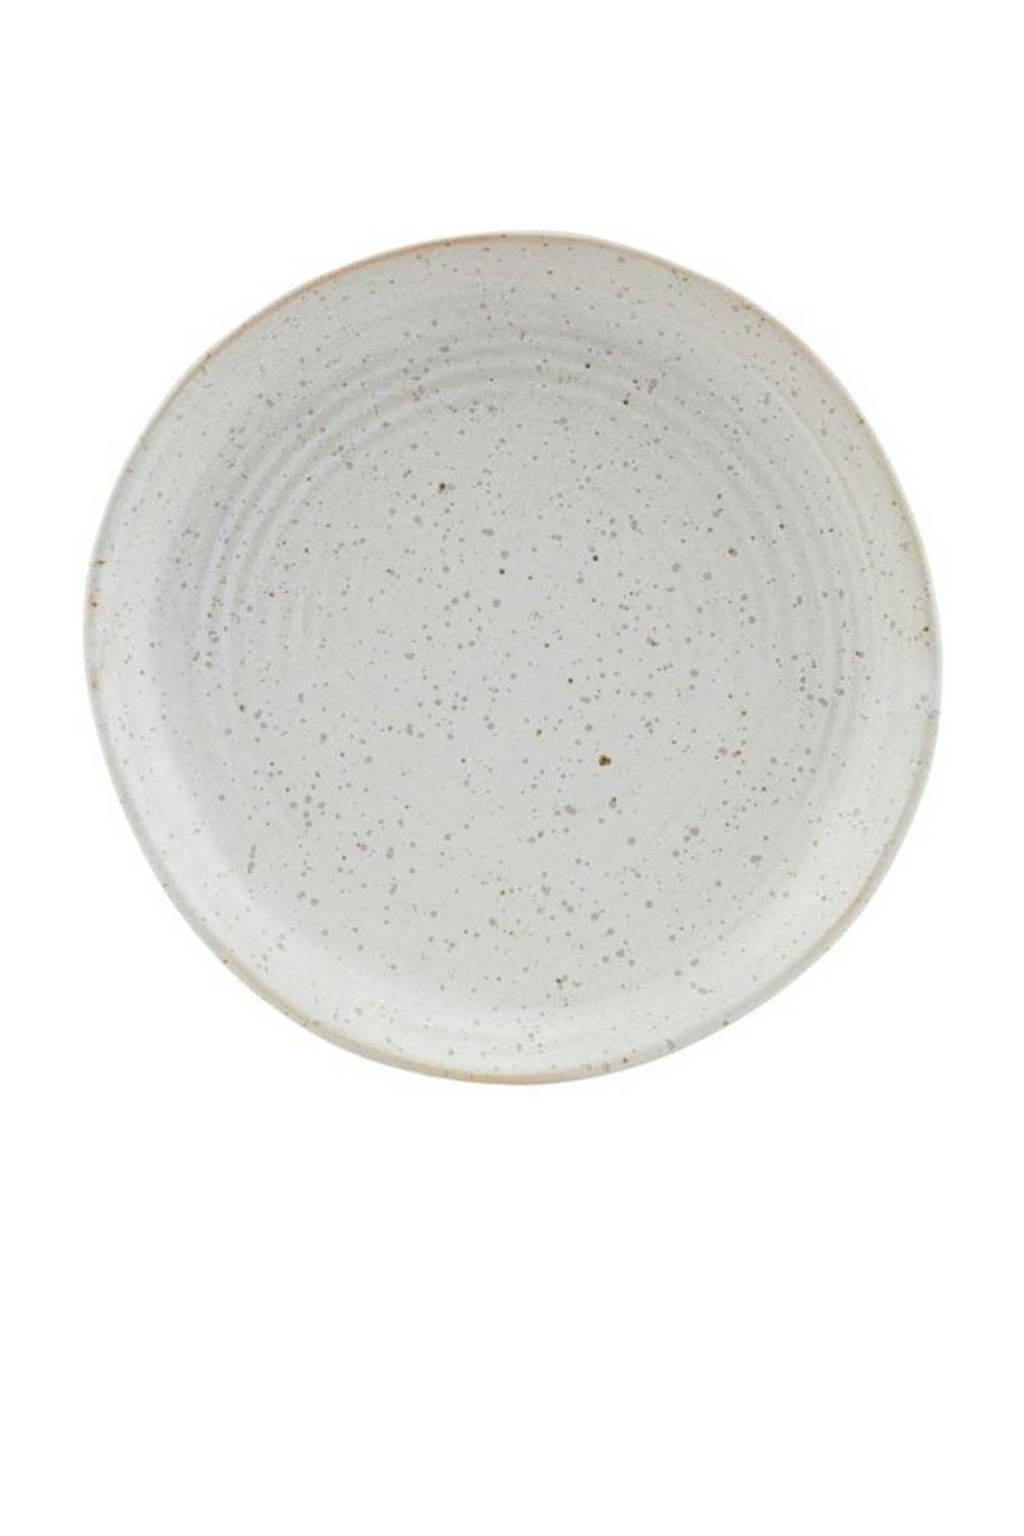 House Doctor gebaksbord Pion (Ø16,5 cm), Grijs/wit